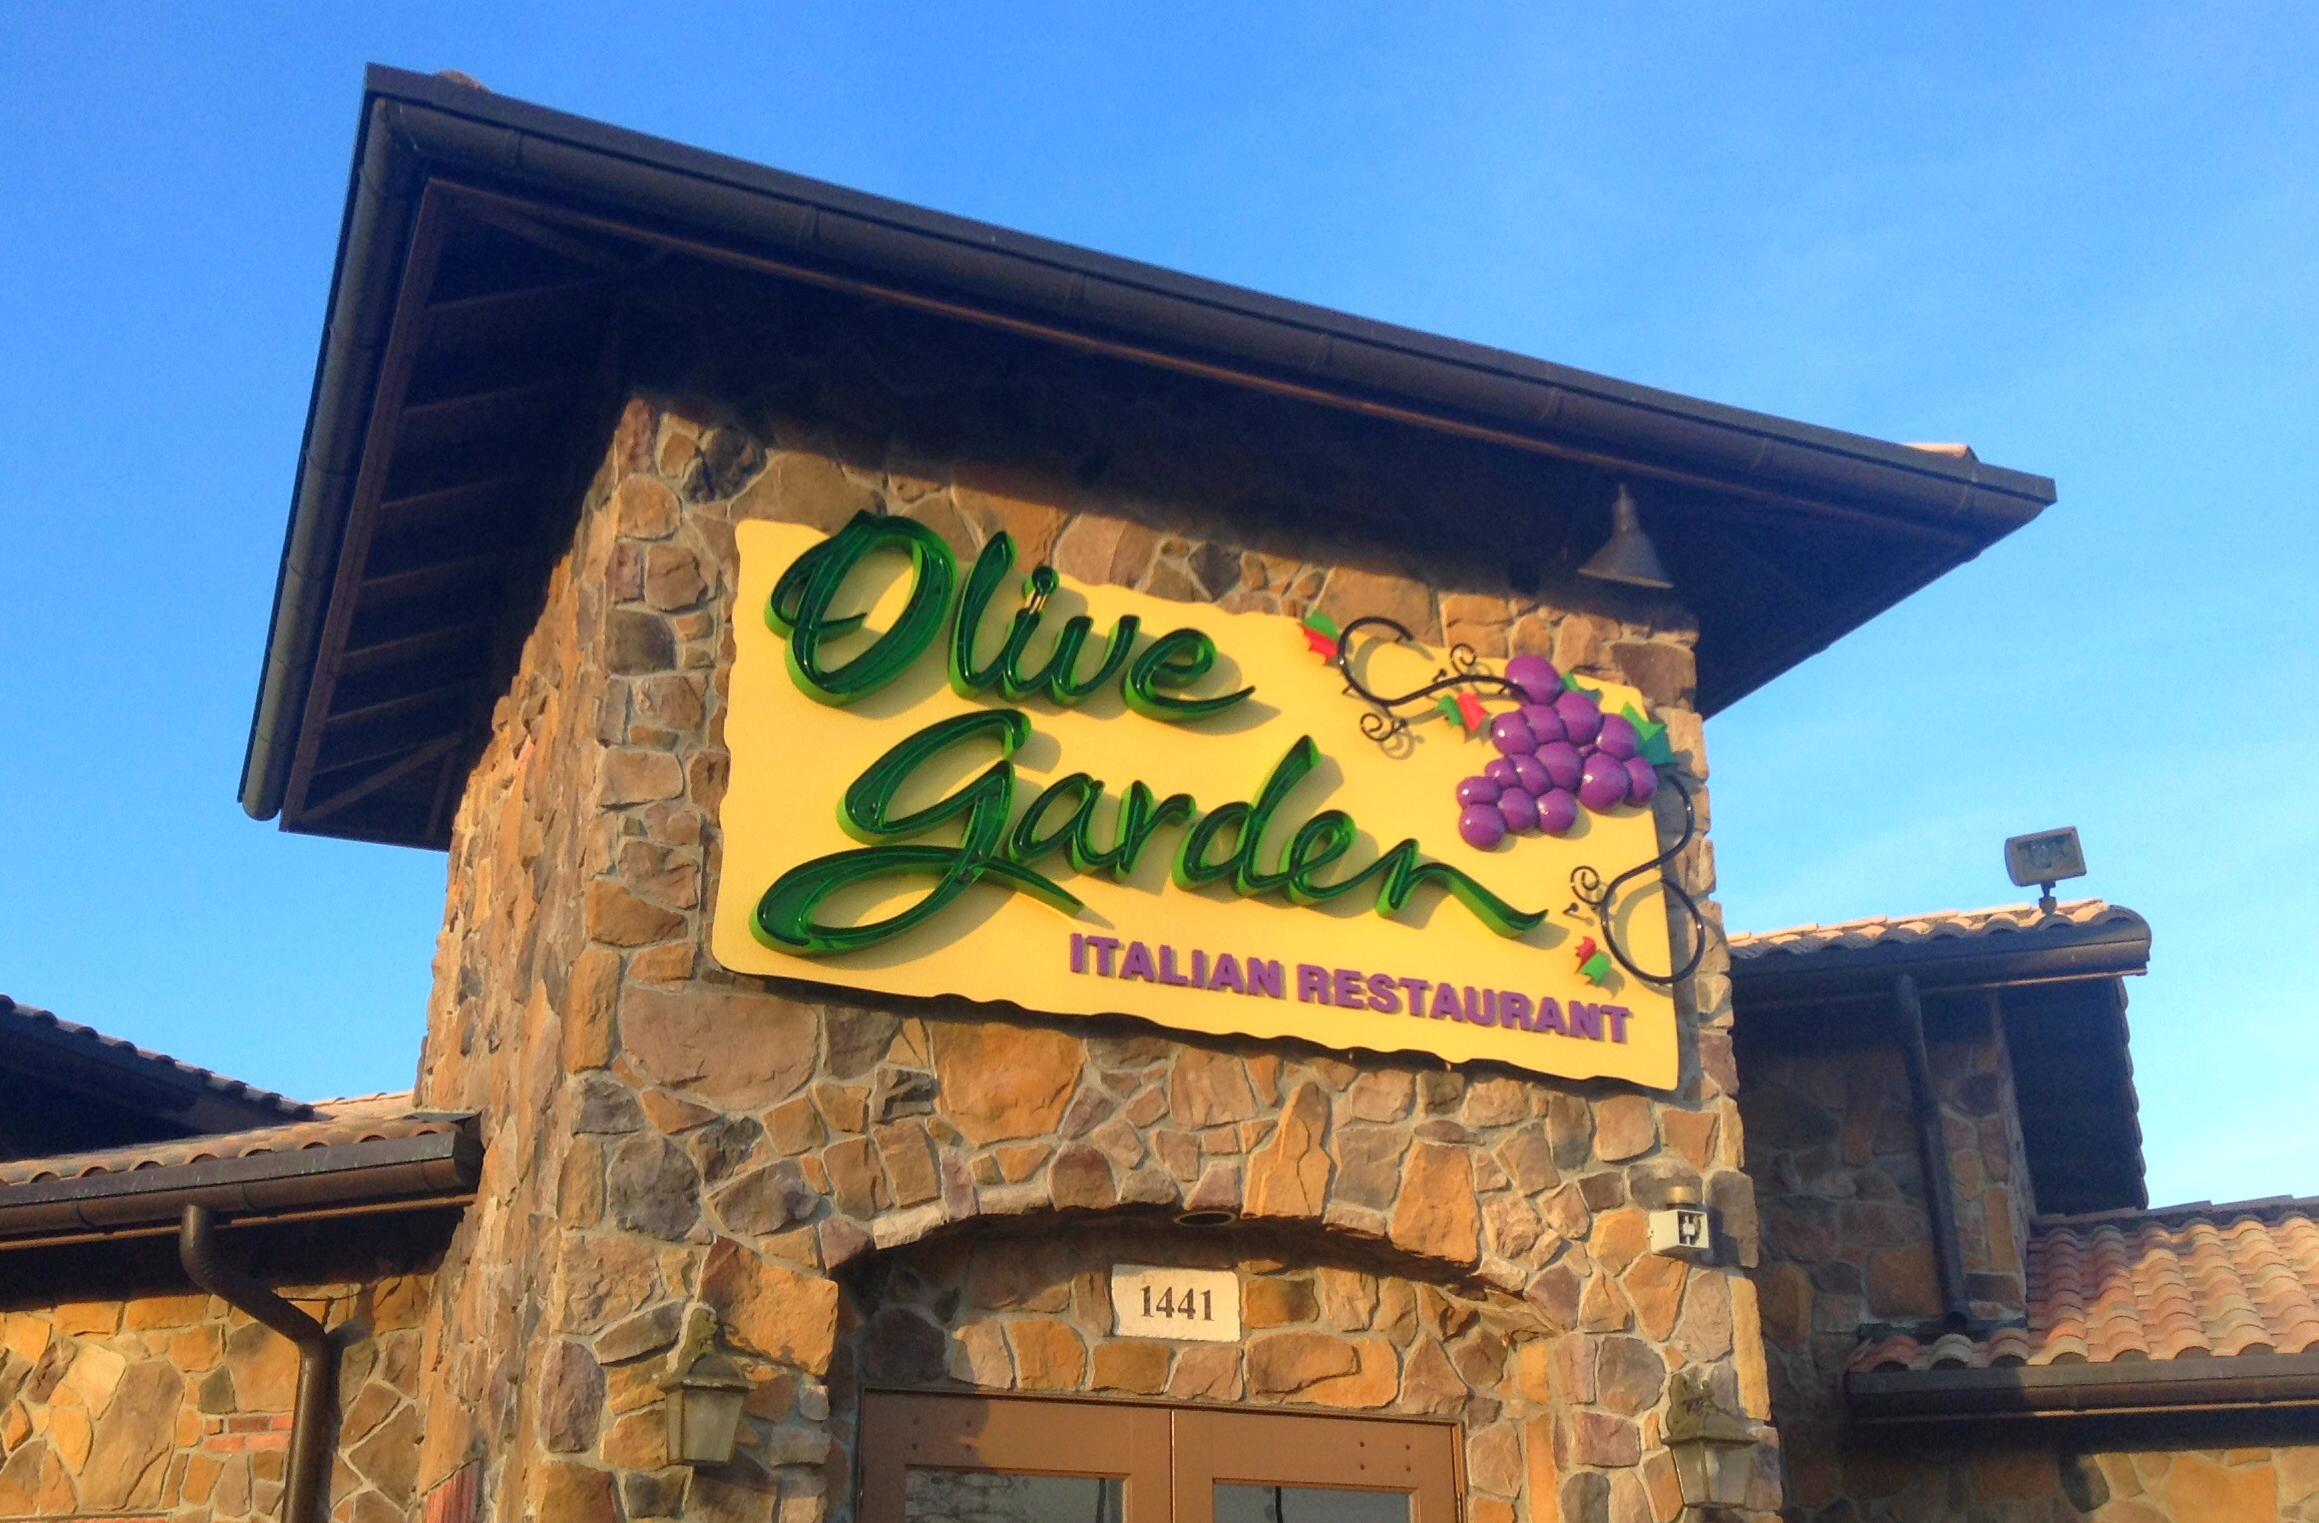 An Olive Garden